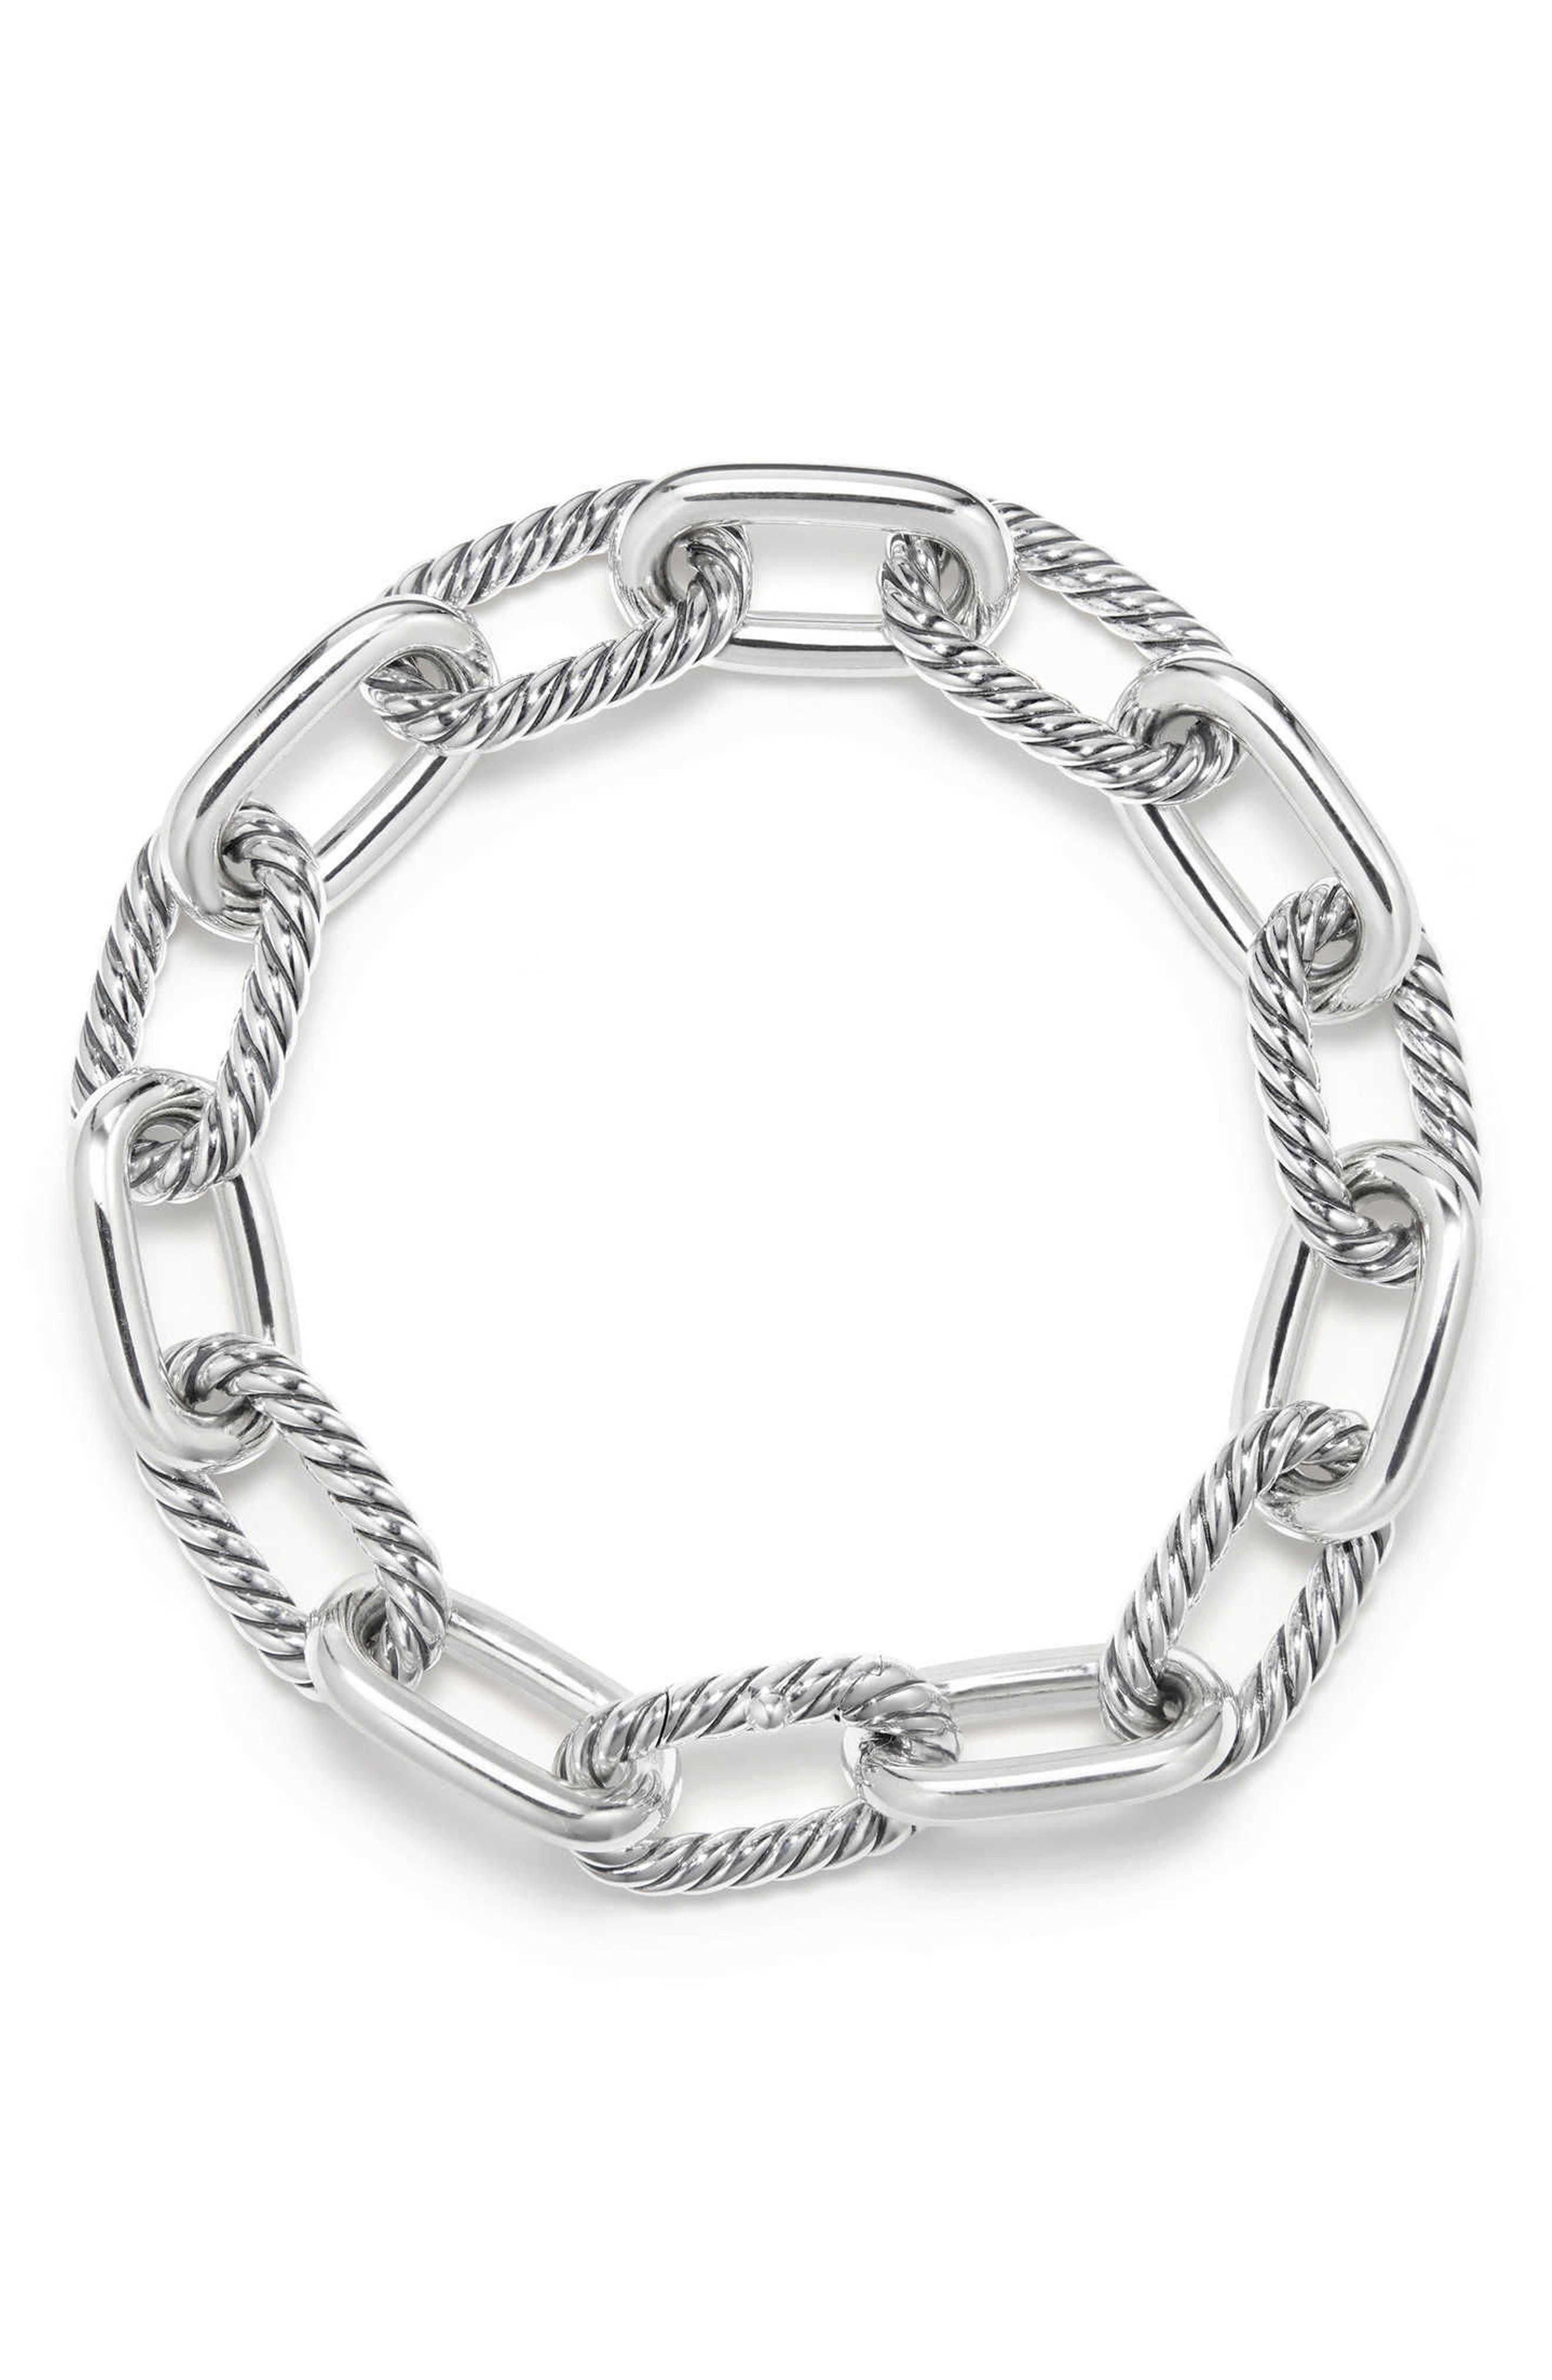 DY Madison Chain Medium Bracelet,                             Alternate thumbnail 2, color,                             Silver